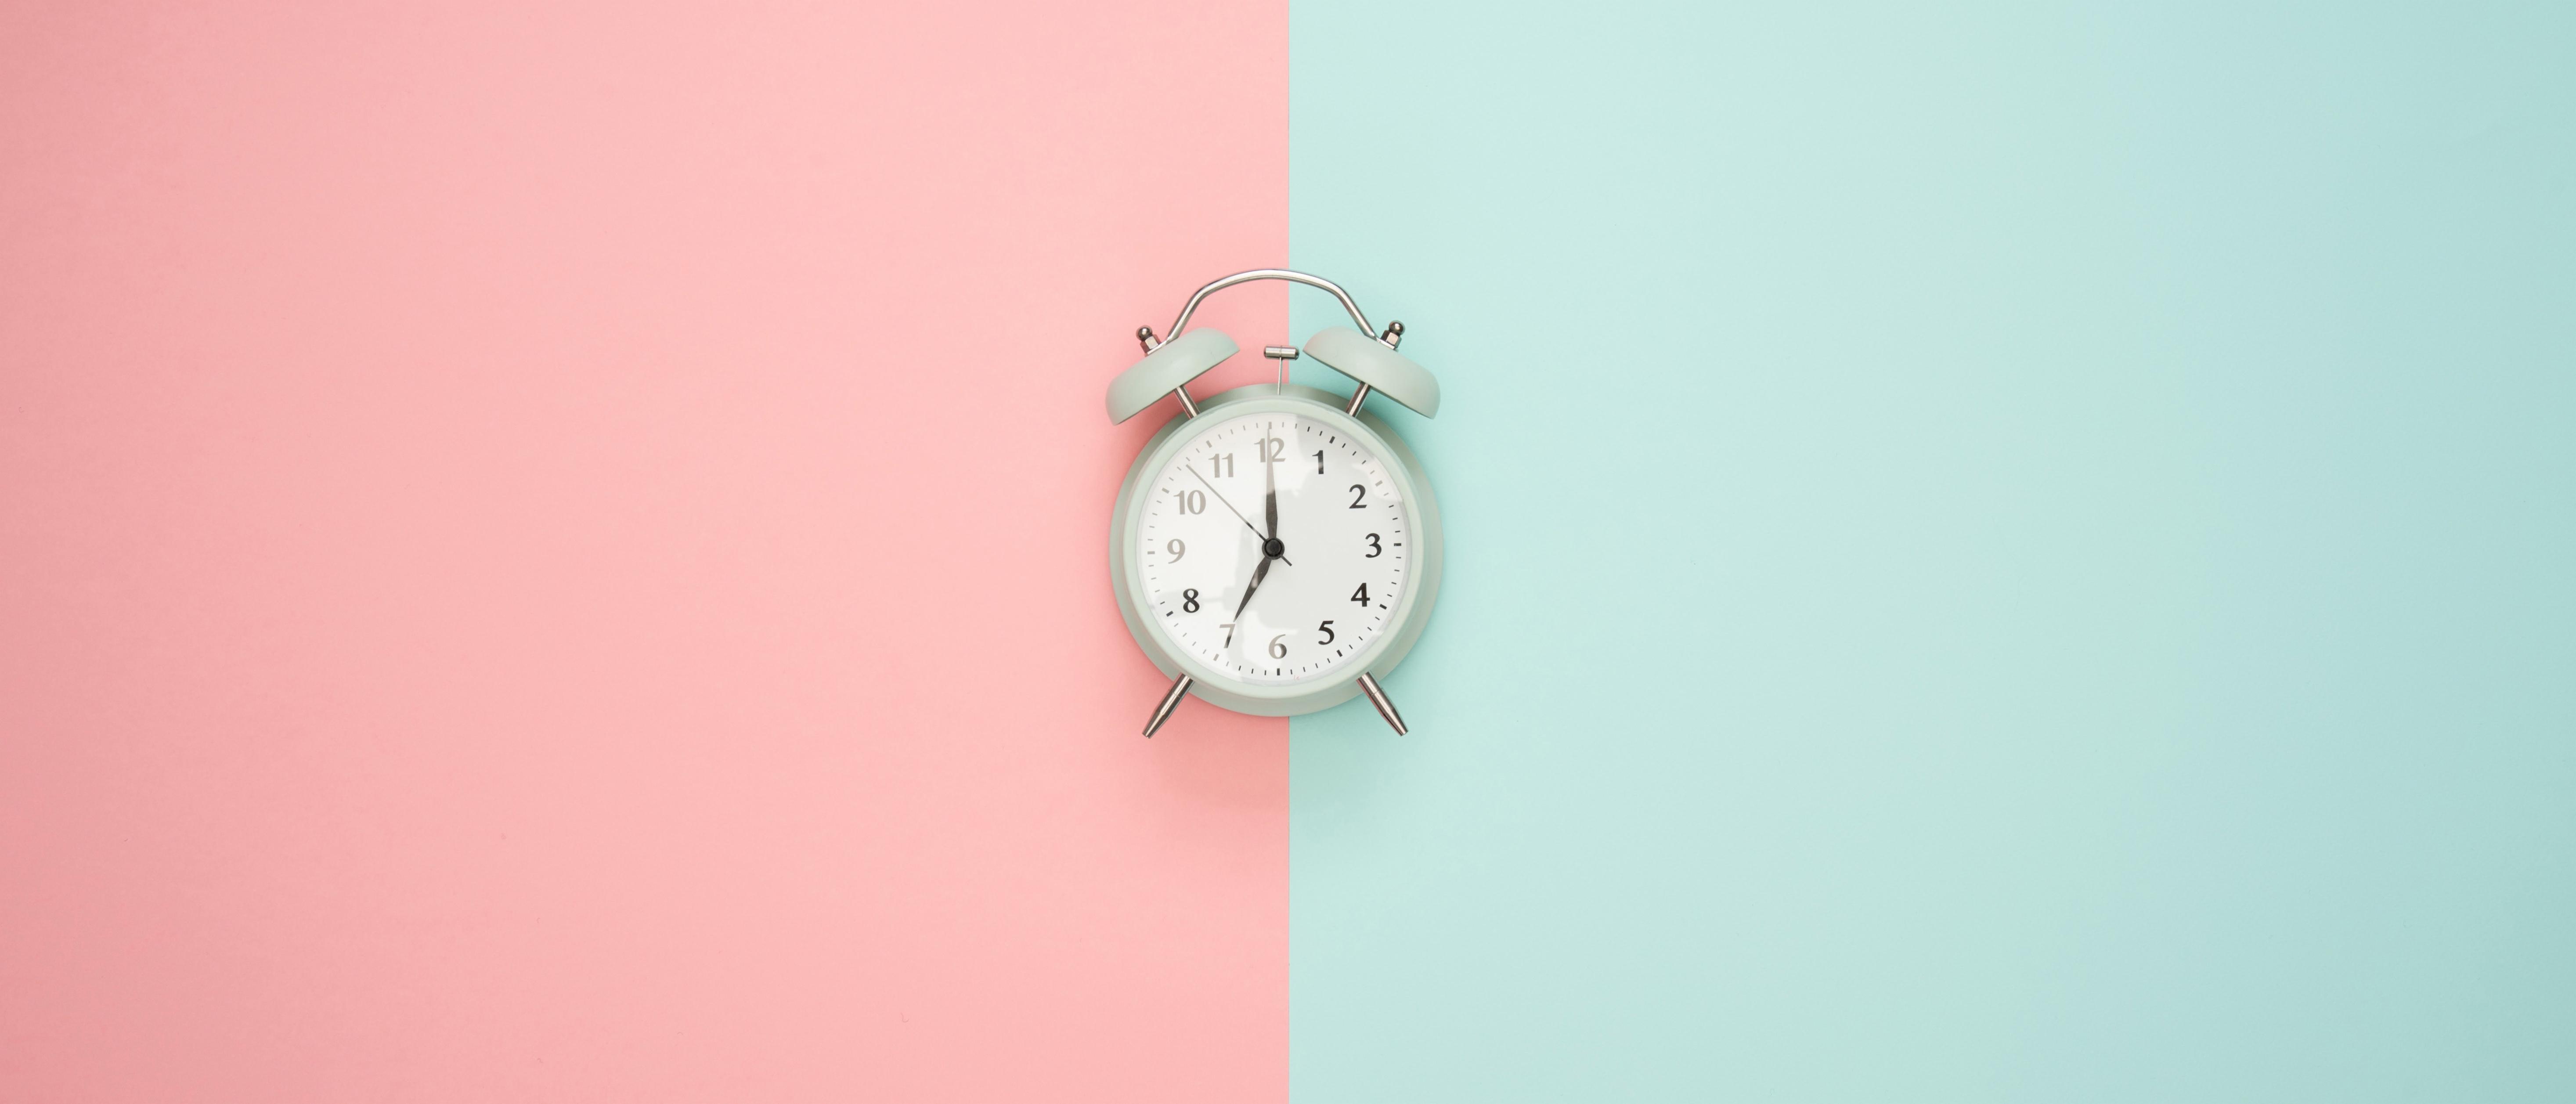 custom-Custom_Size___alarm-clock-art-background-1037993